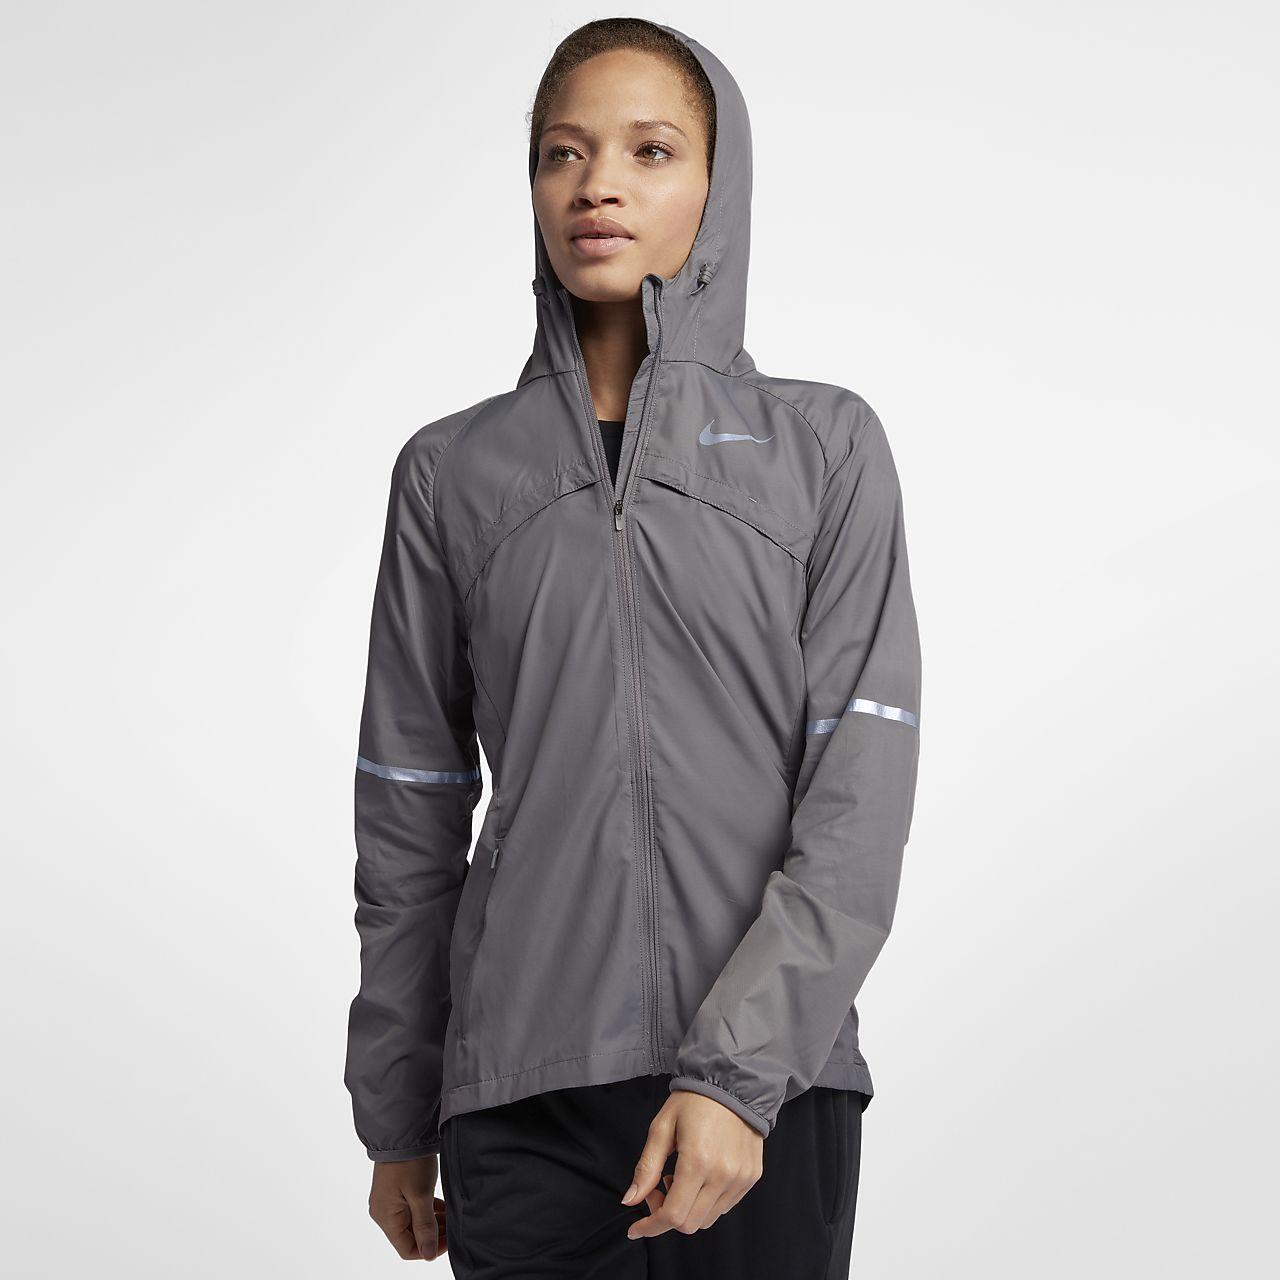 c95f4e12bf4f Nike Shield Women s Running Jacket. Nike.com AU